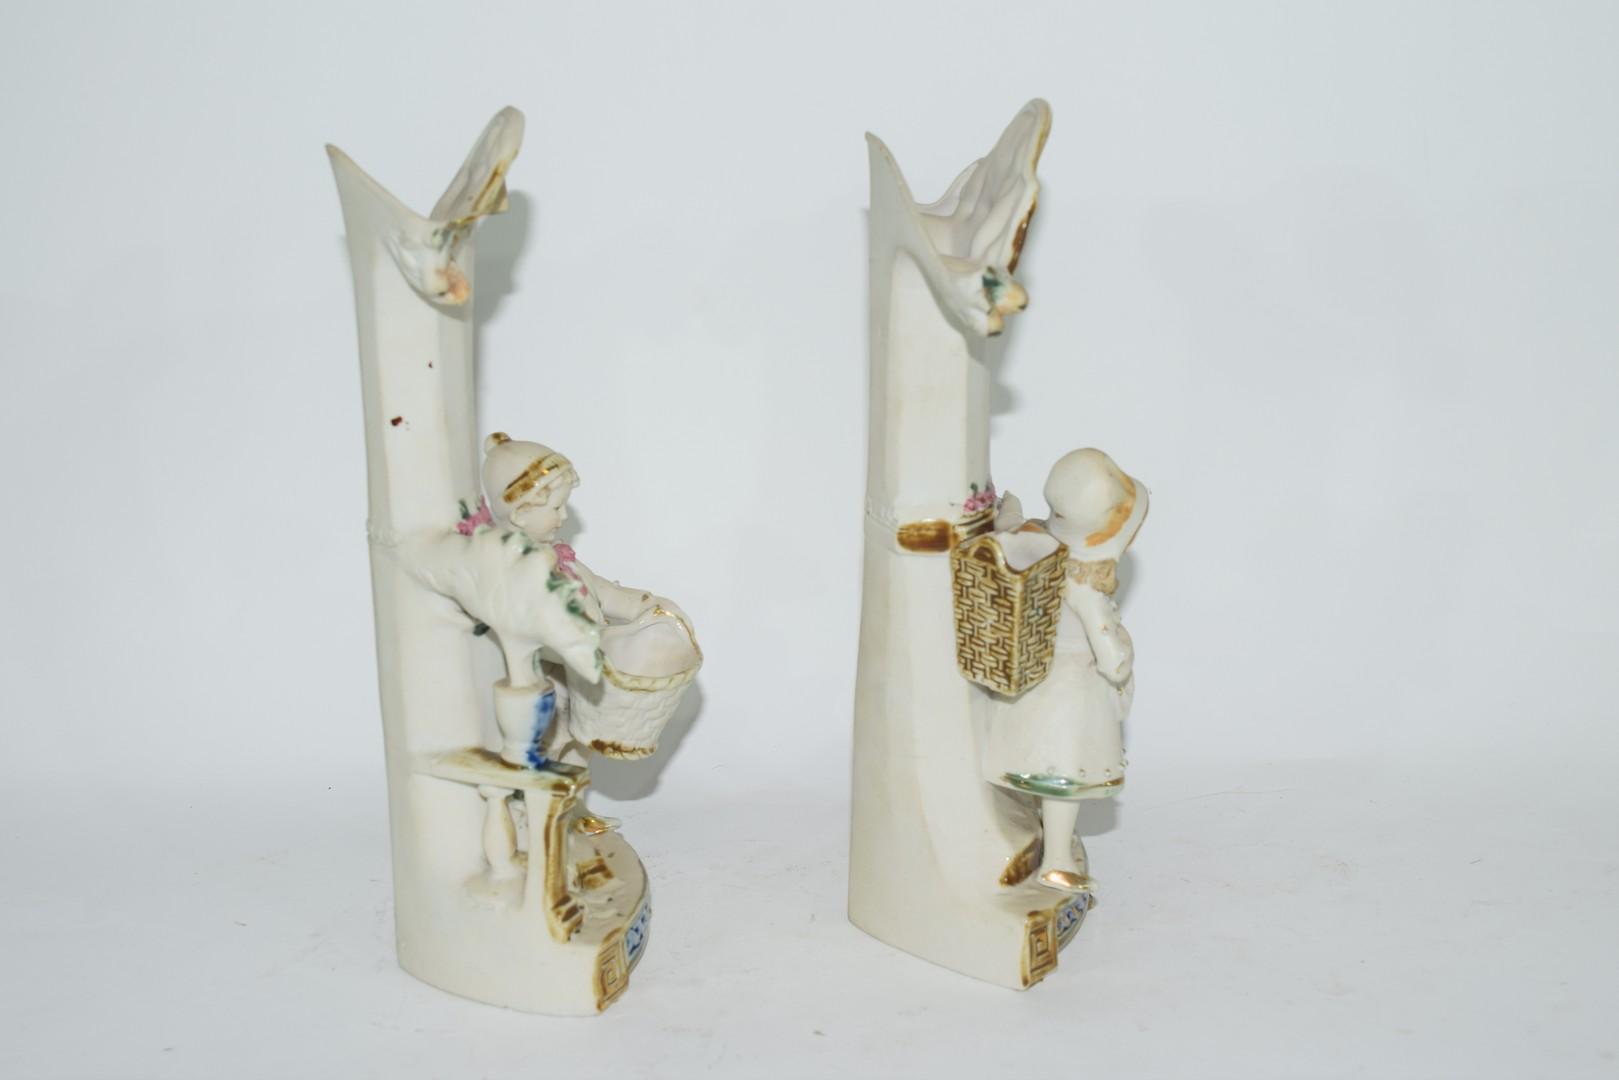 Pair of bisque porcelain spill holder vases - Image 4 of 4